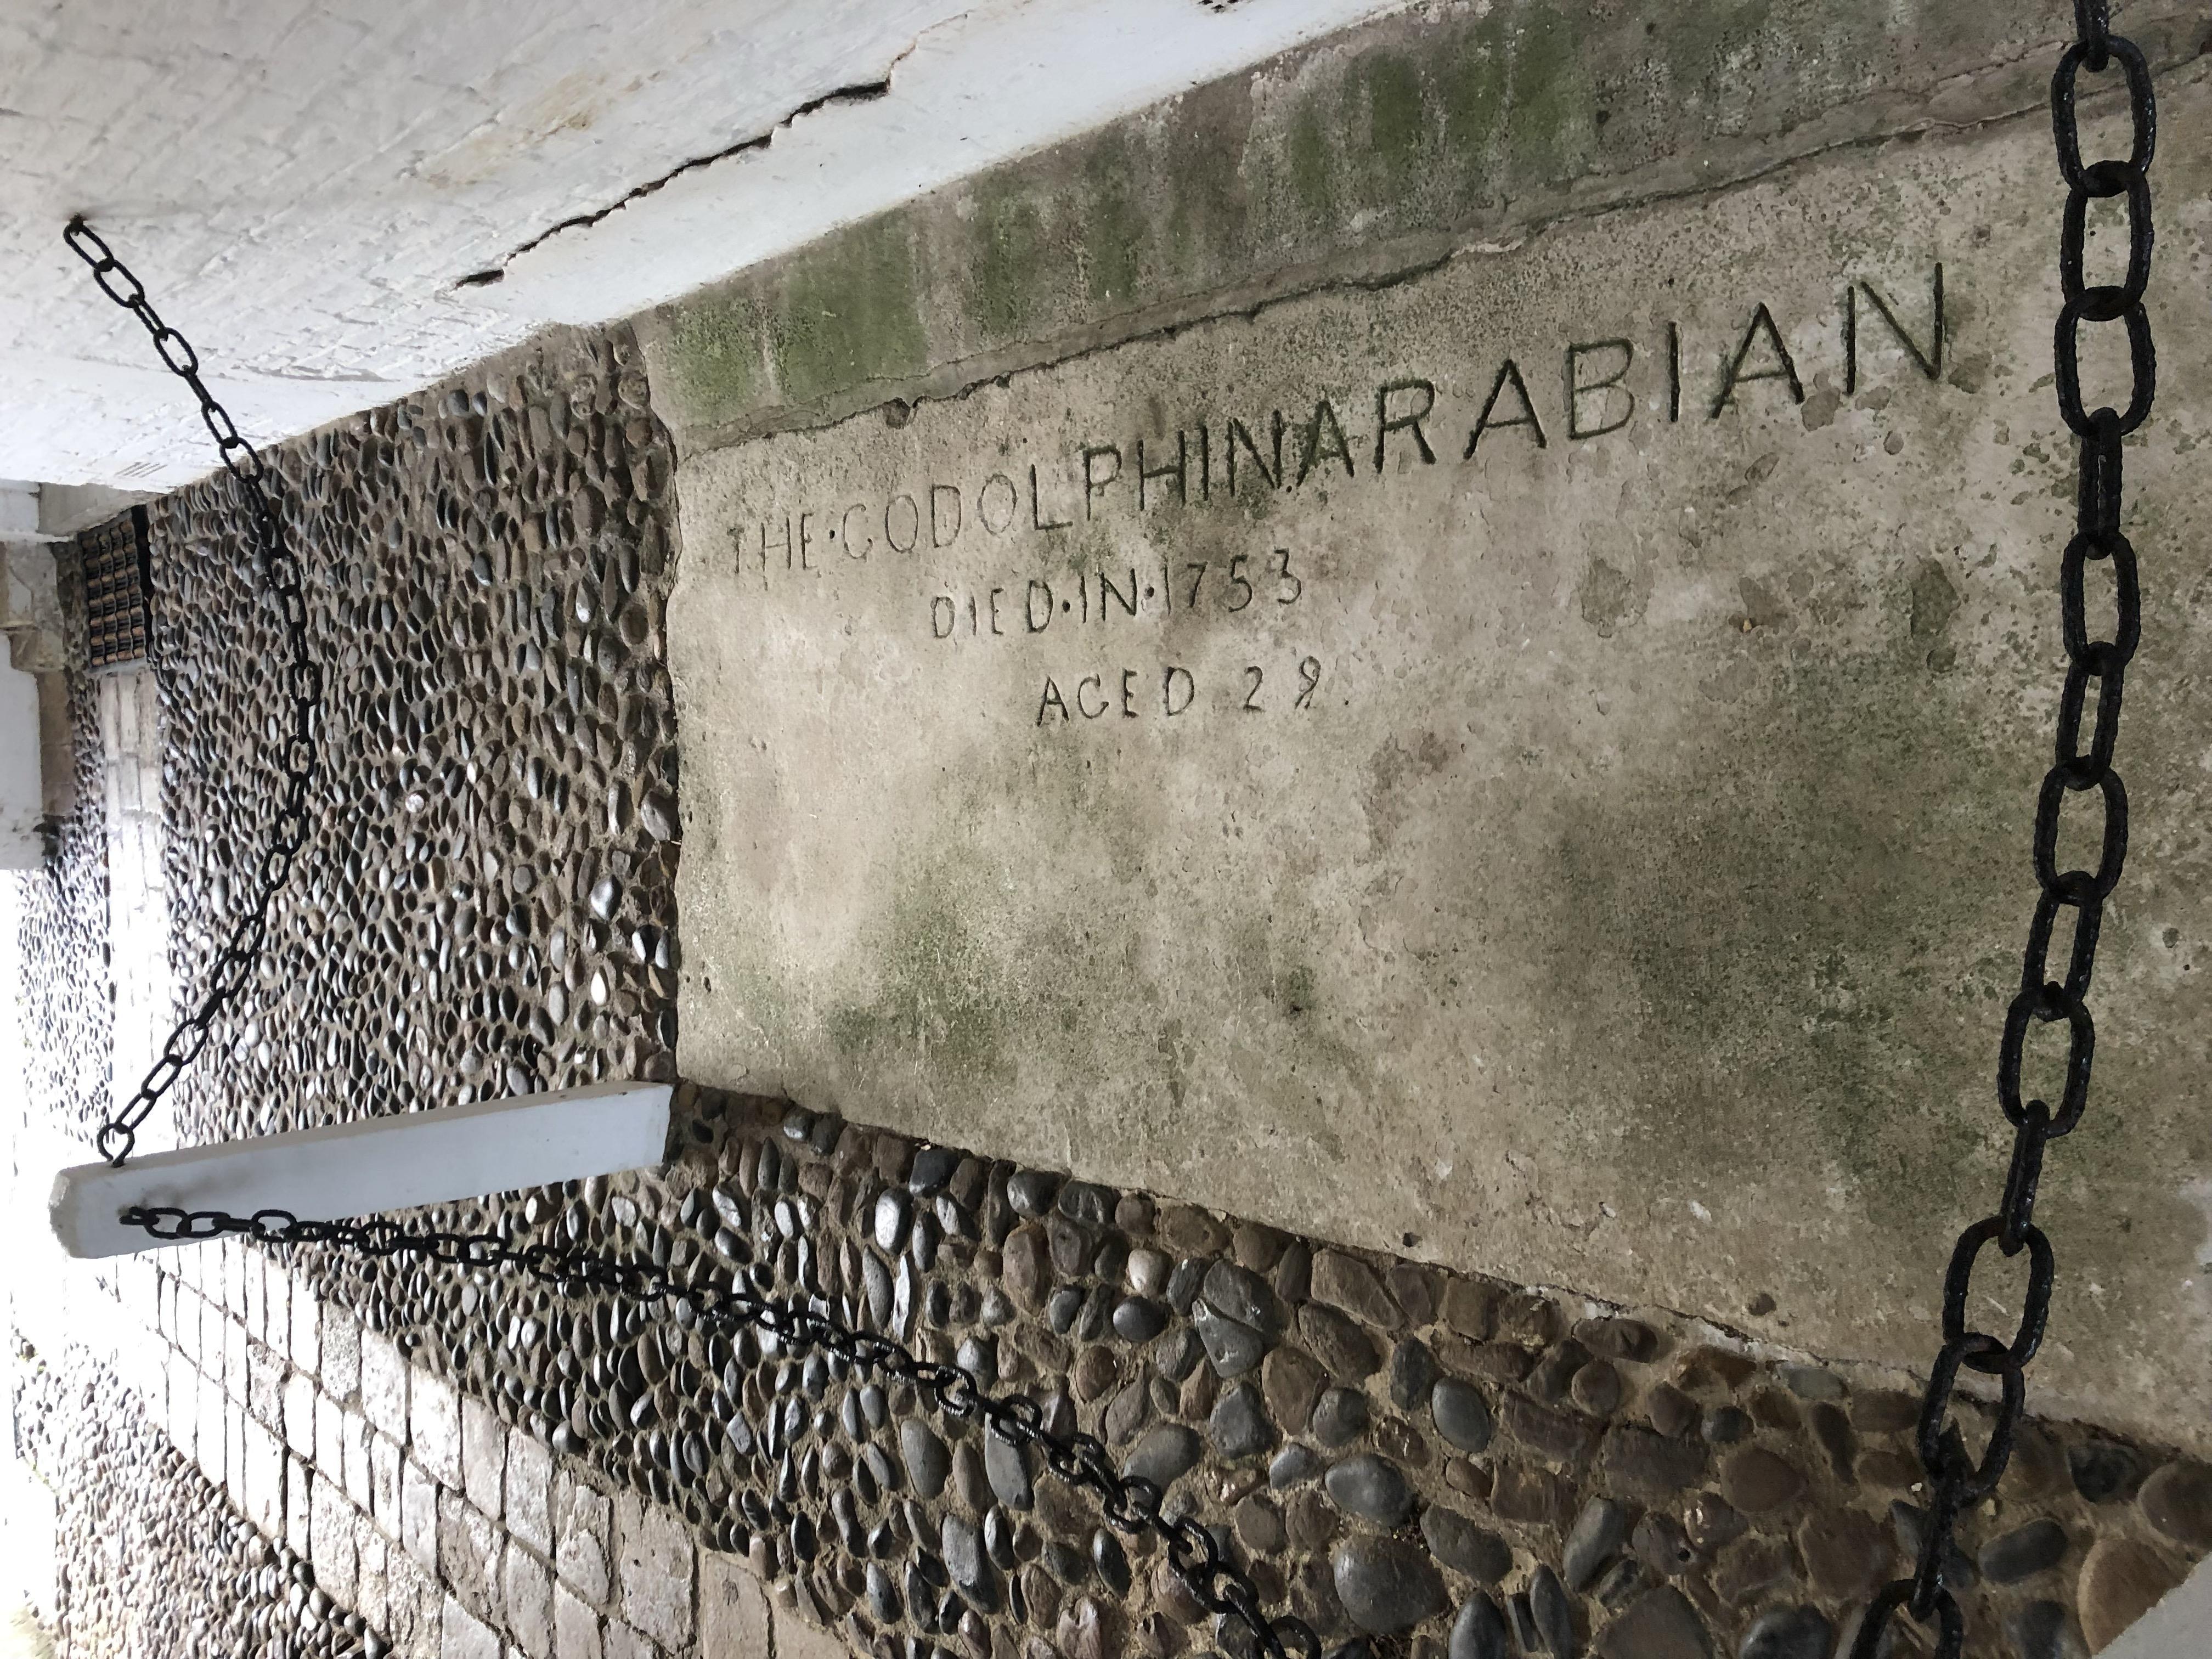 The grave of the Godolphin Arabian